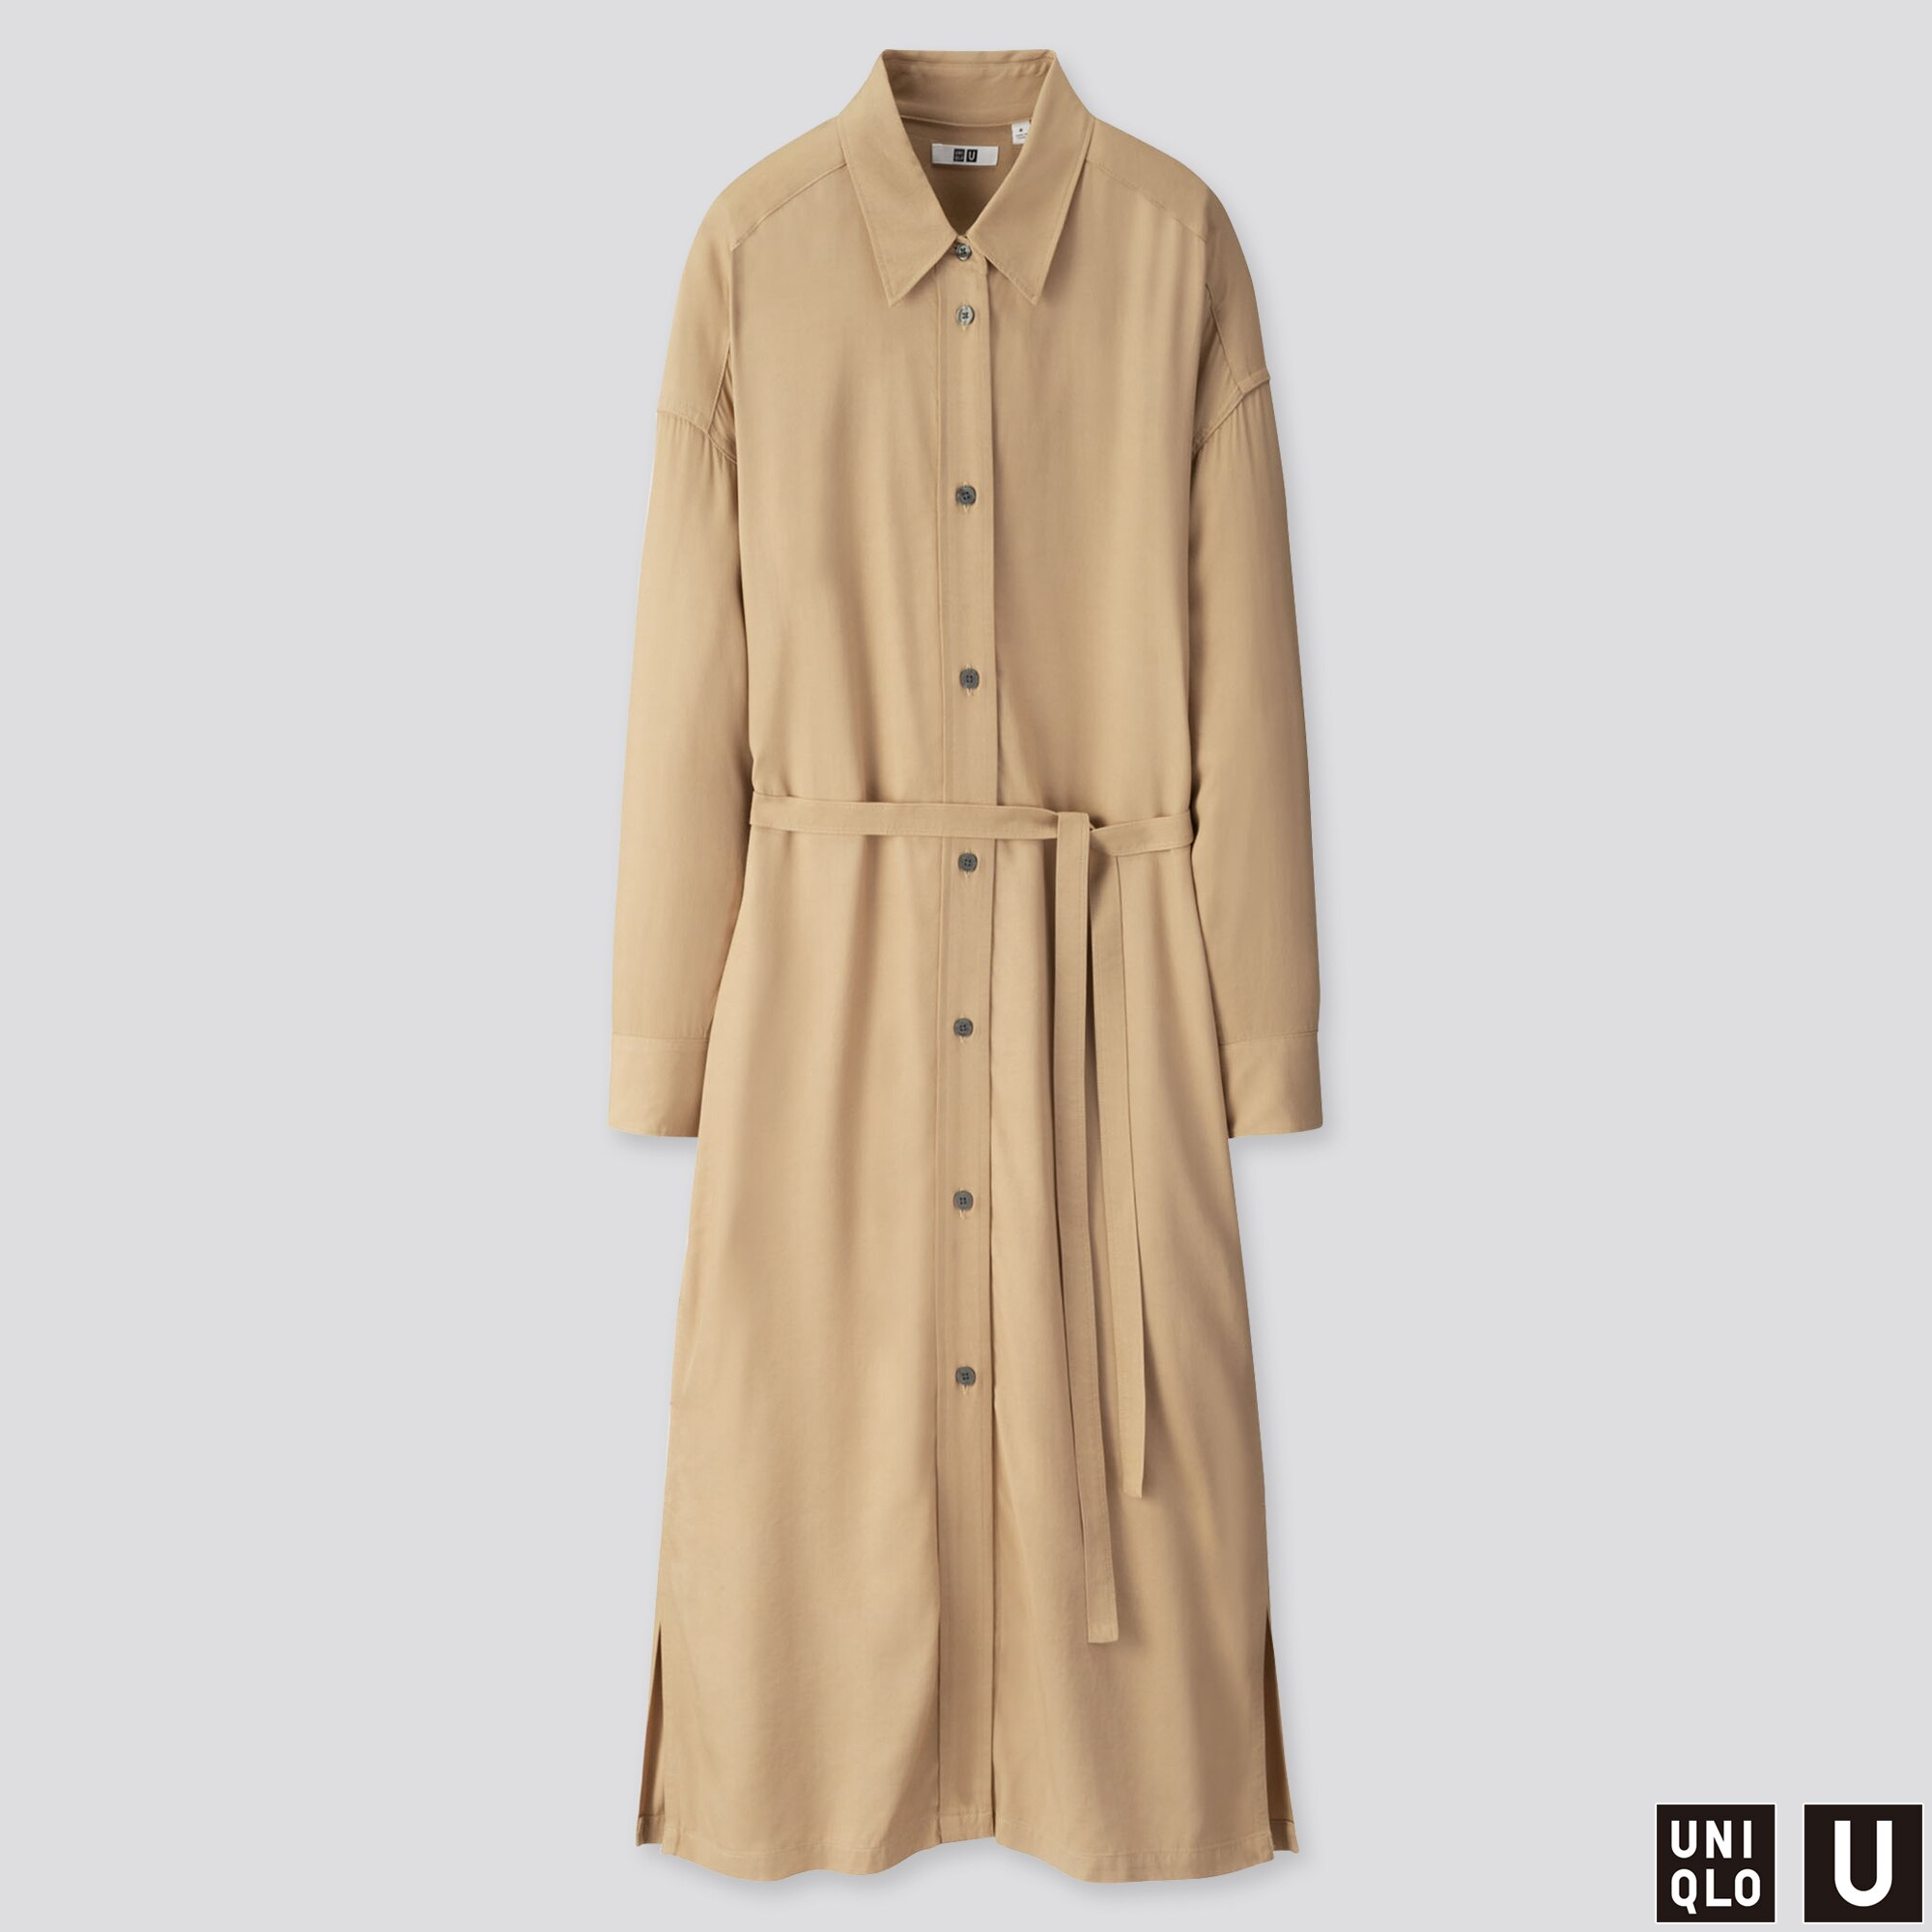 WOMEN U DRAPE TWILL SHIRT LONG-SLEEVE DRESS